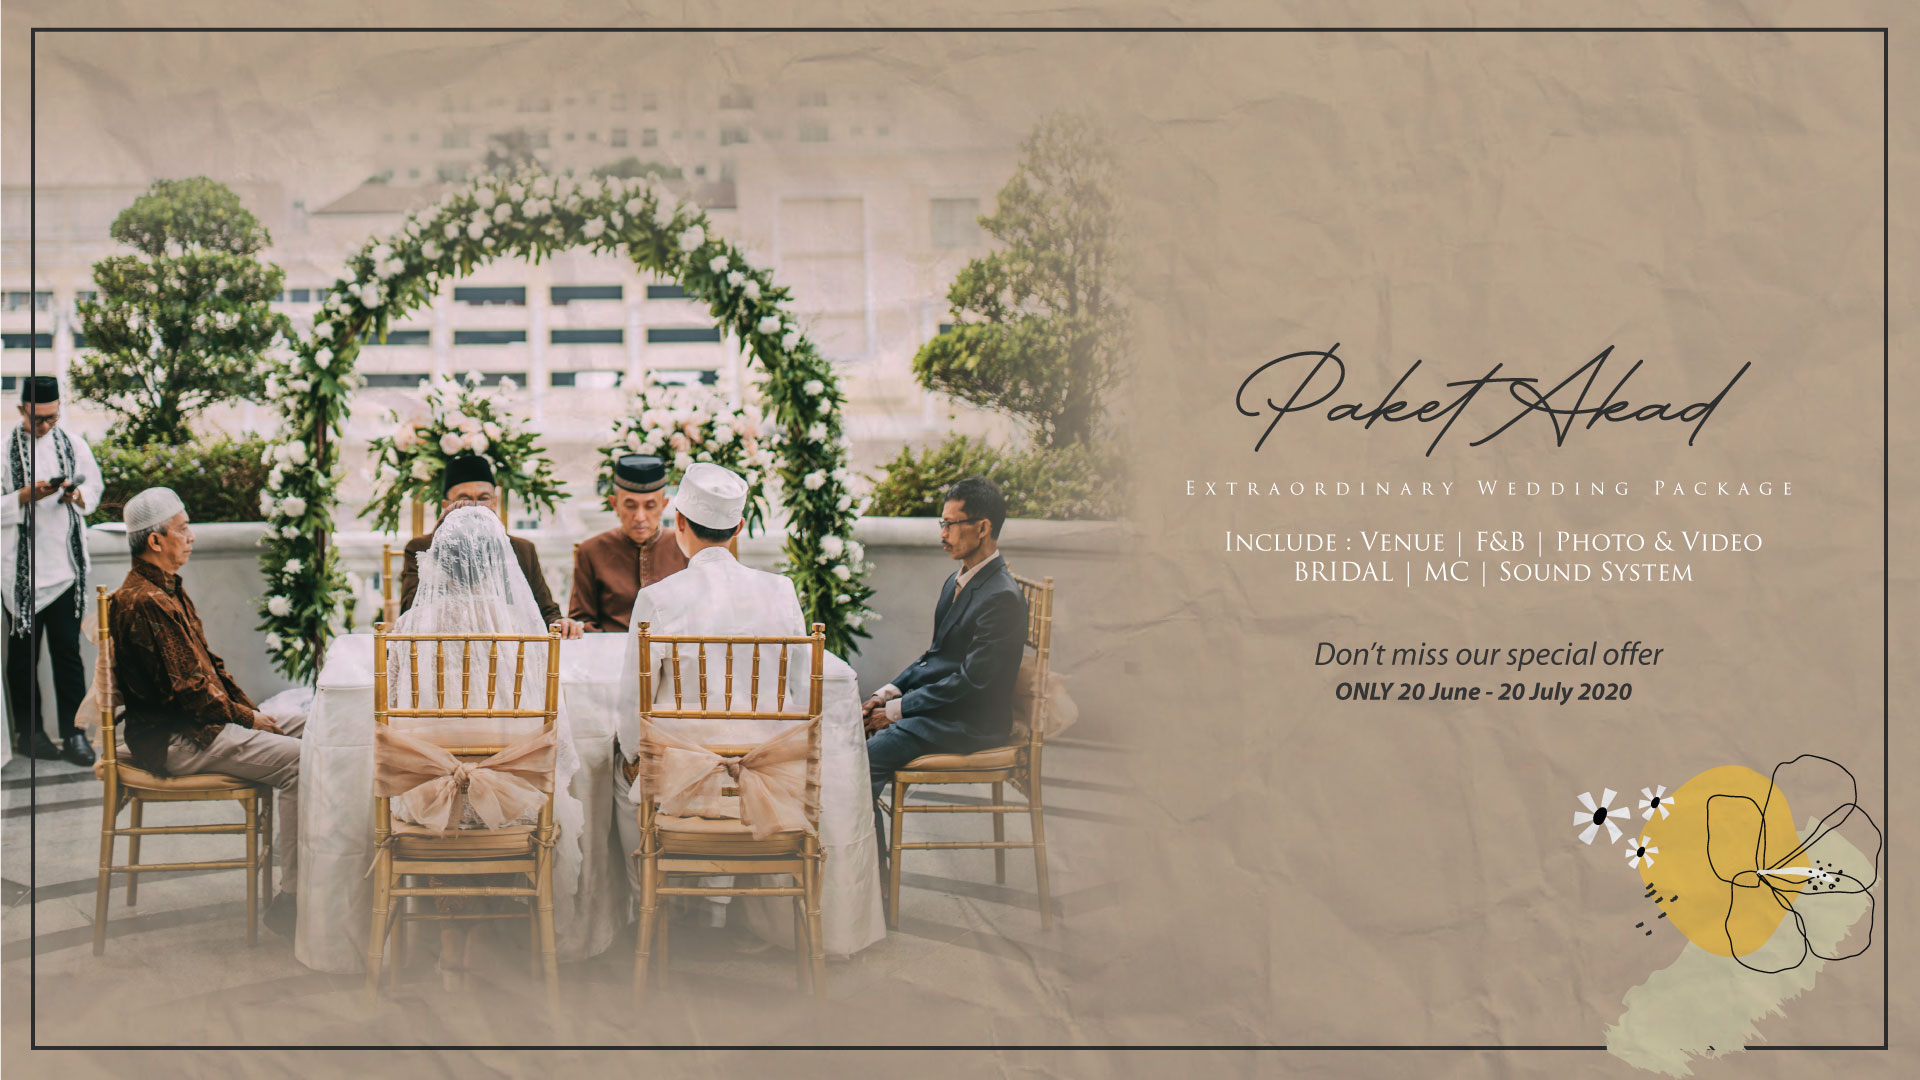 Paket Akad | Extraordinary Wedding Package